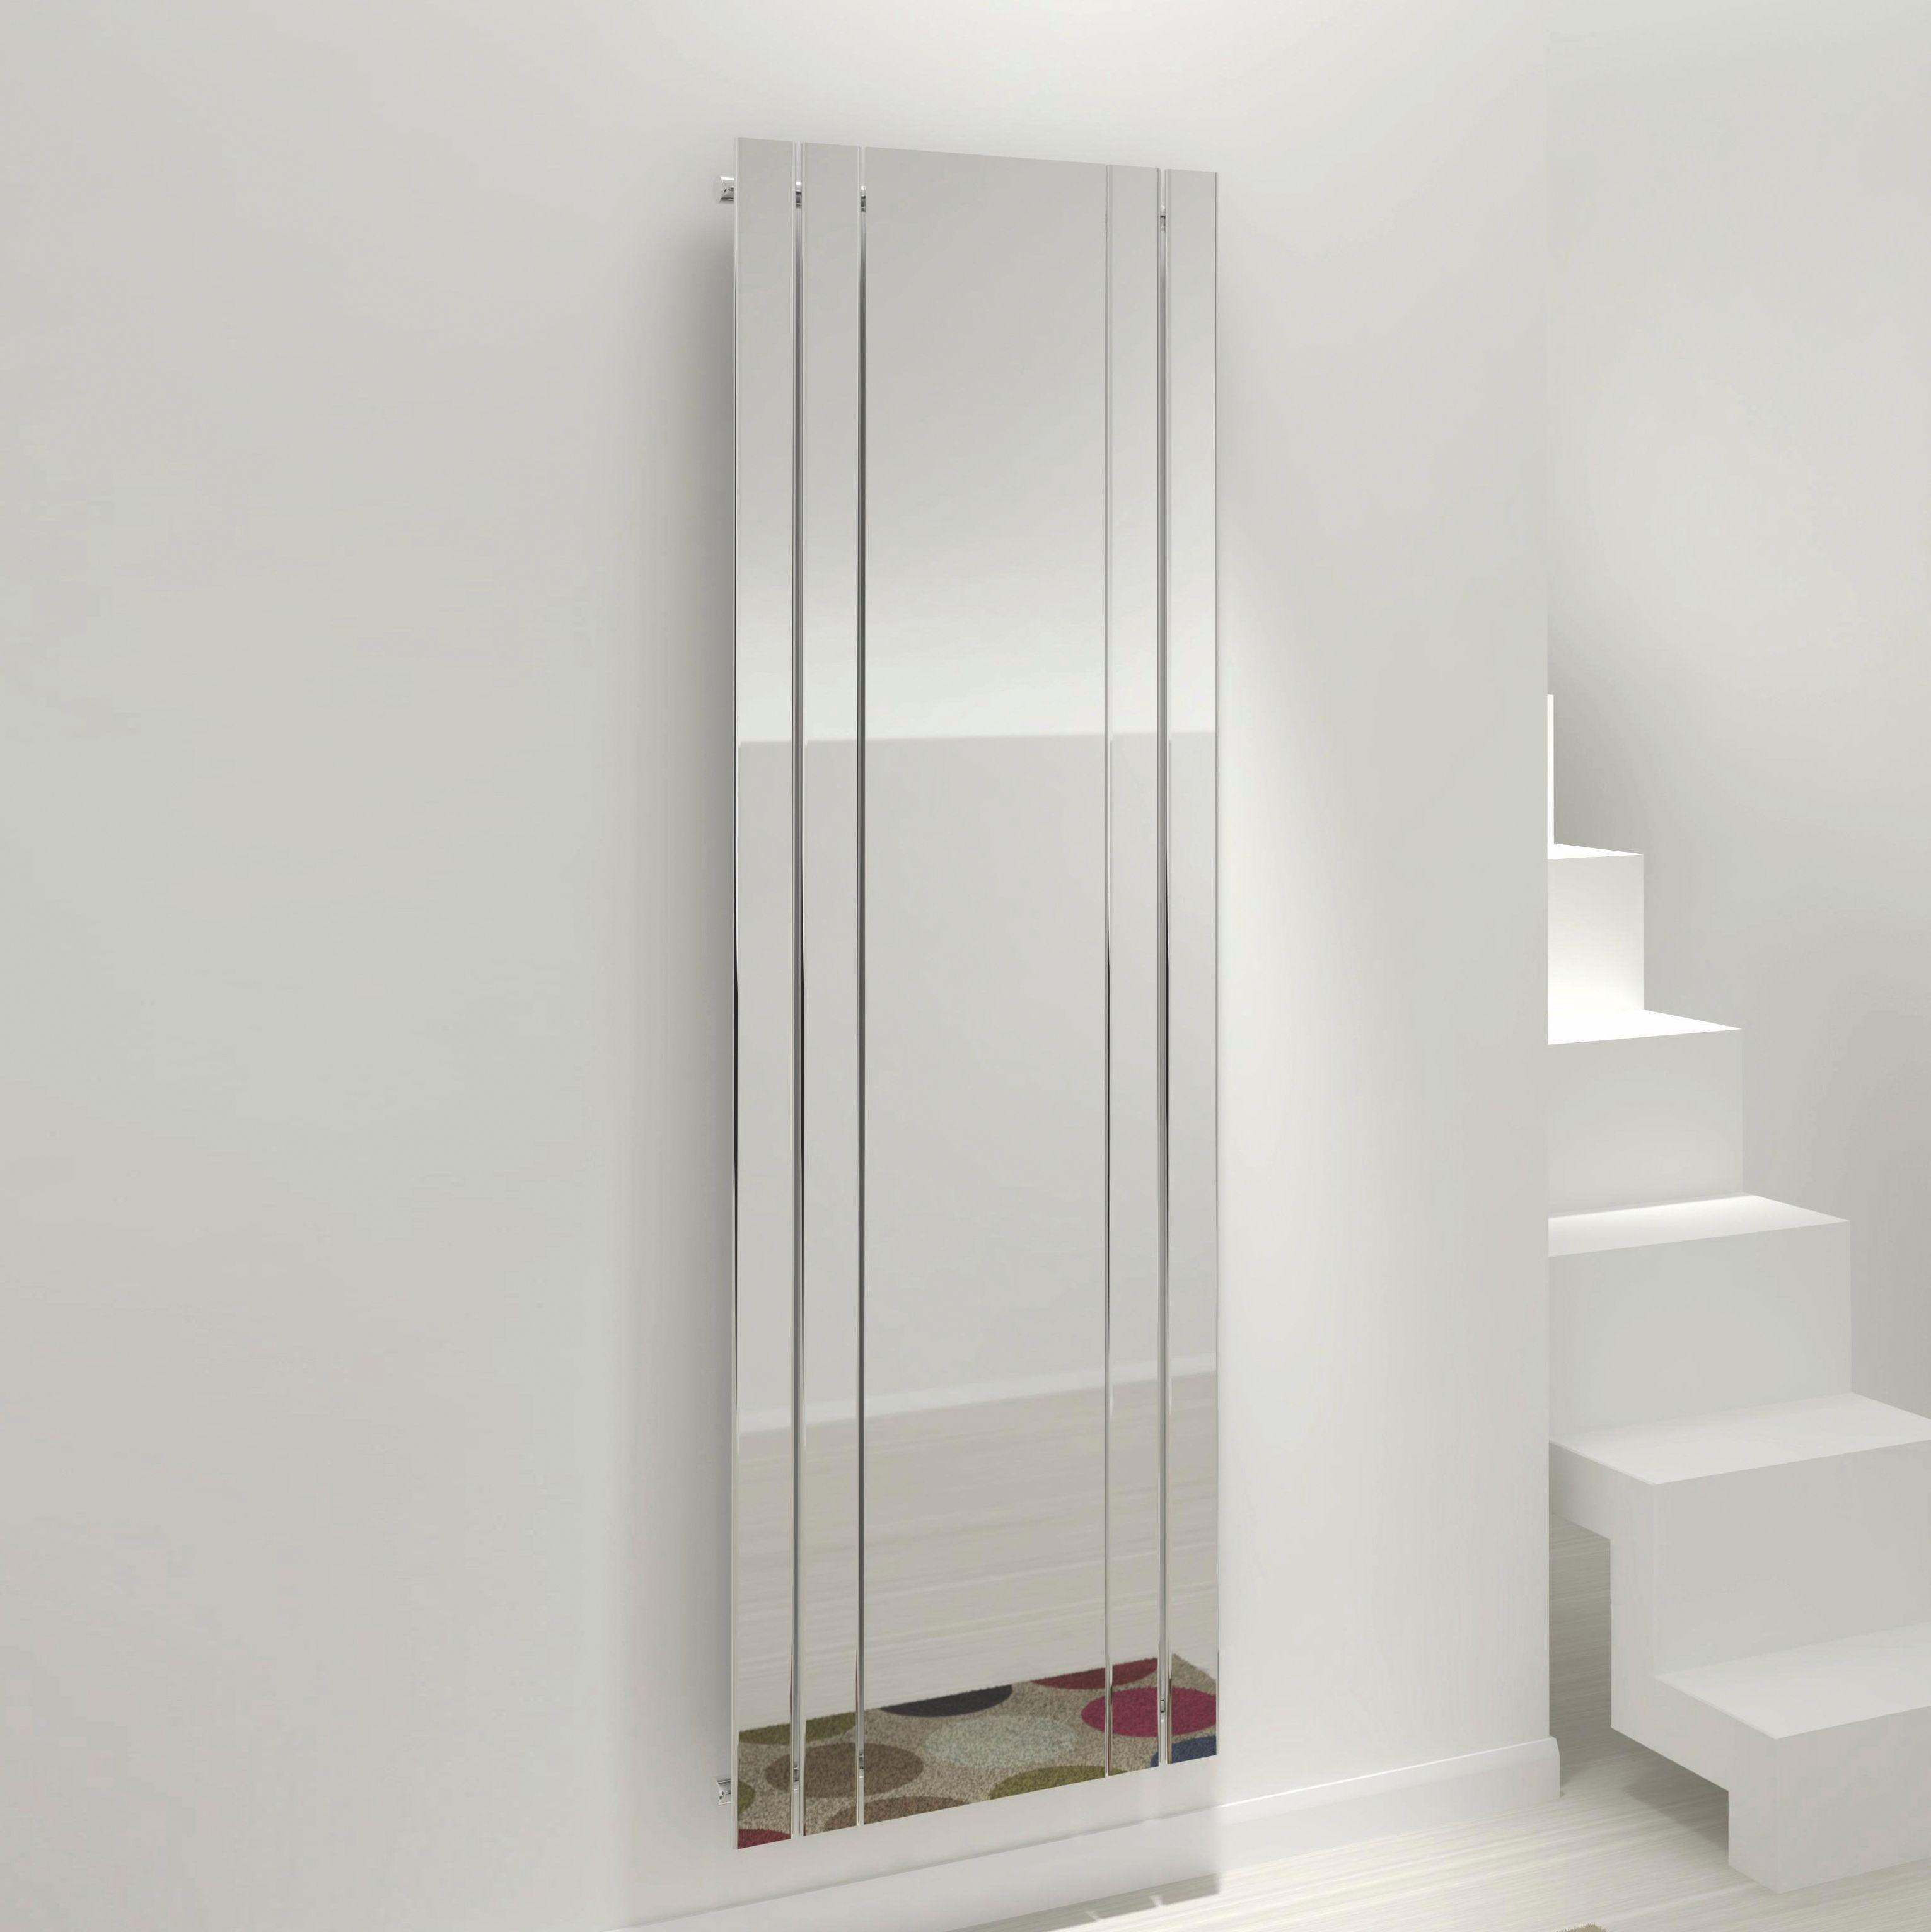 Kudox Tova Mirror Vertical Radiator Chrome (H)1800 mm (W)600 mm ...